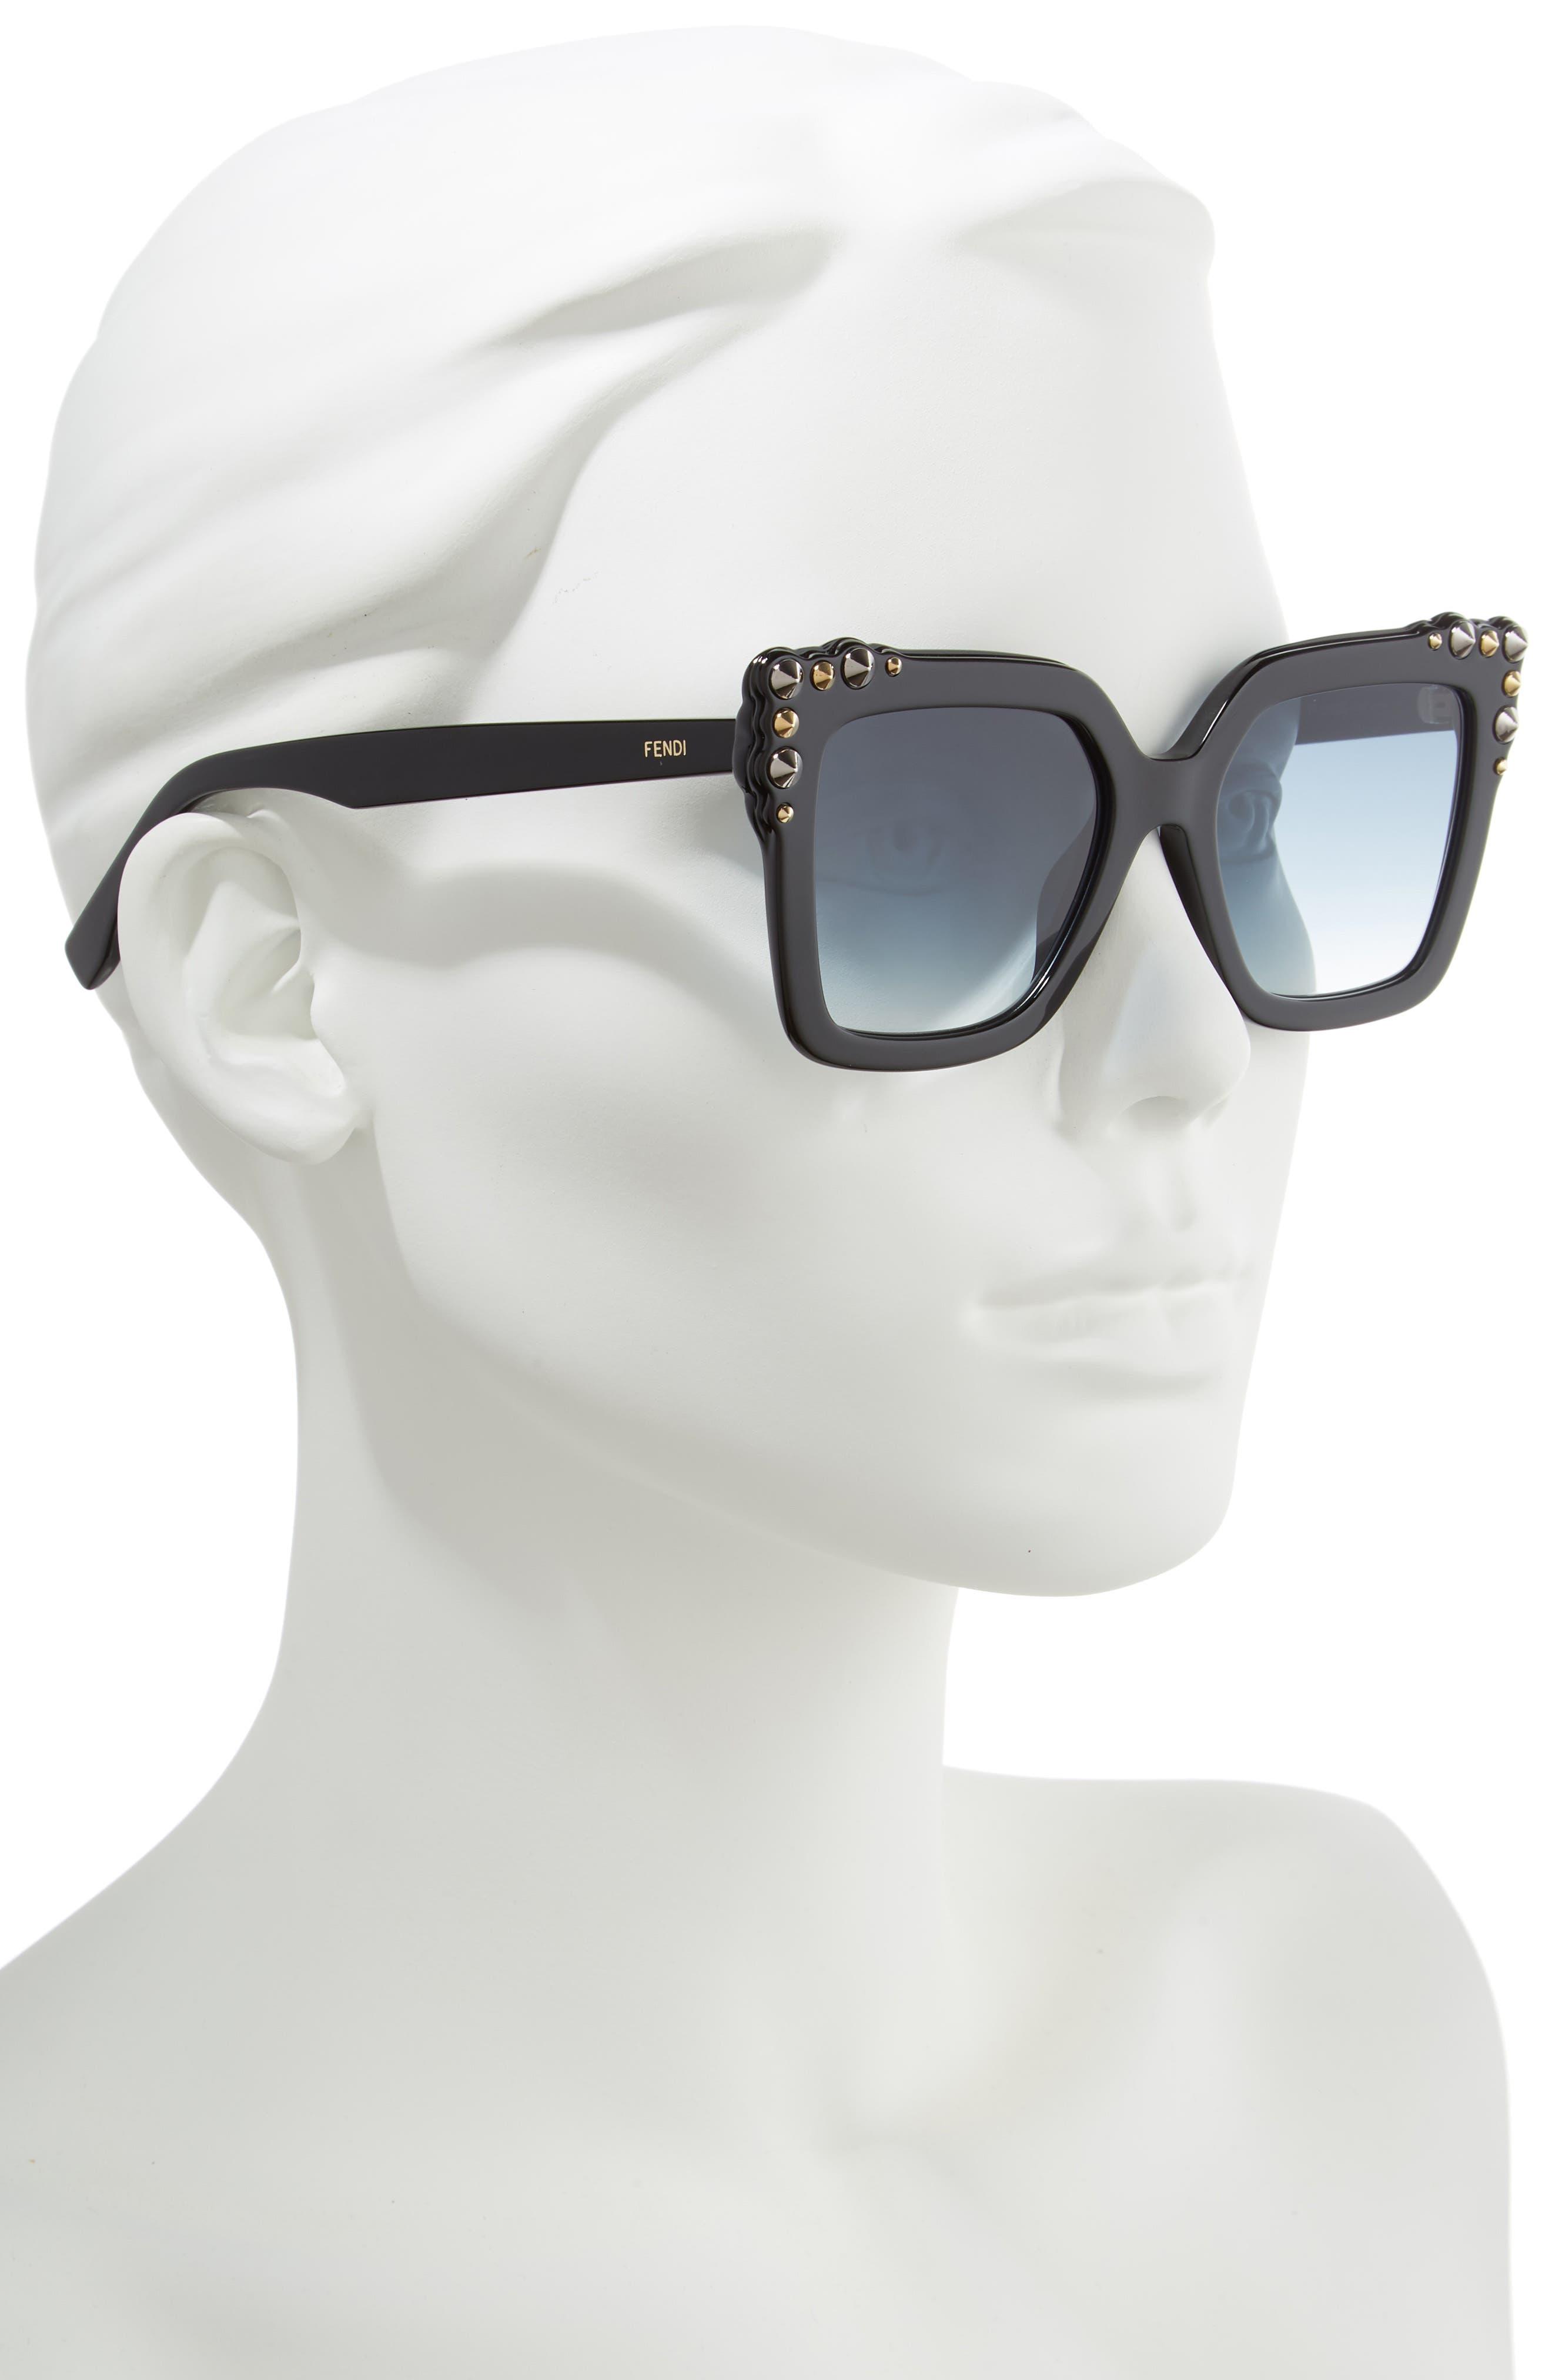 52mm Gradient Cat Eye Sunglasses,                             Alternate thumbnail 2, color,                             002